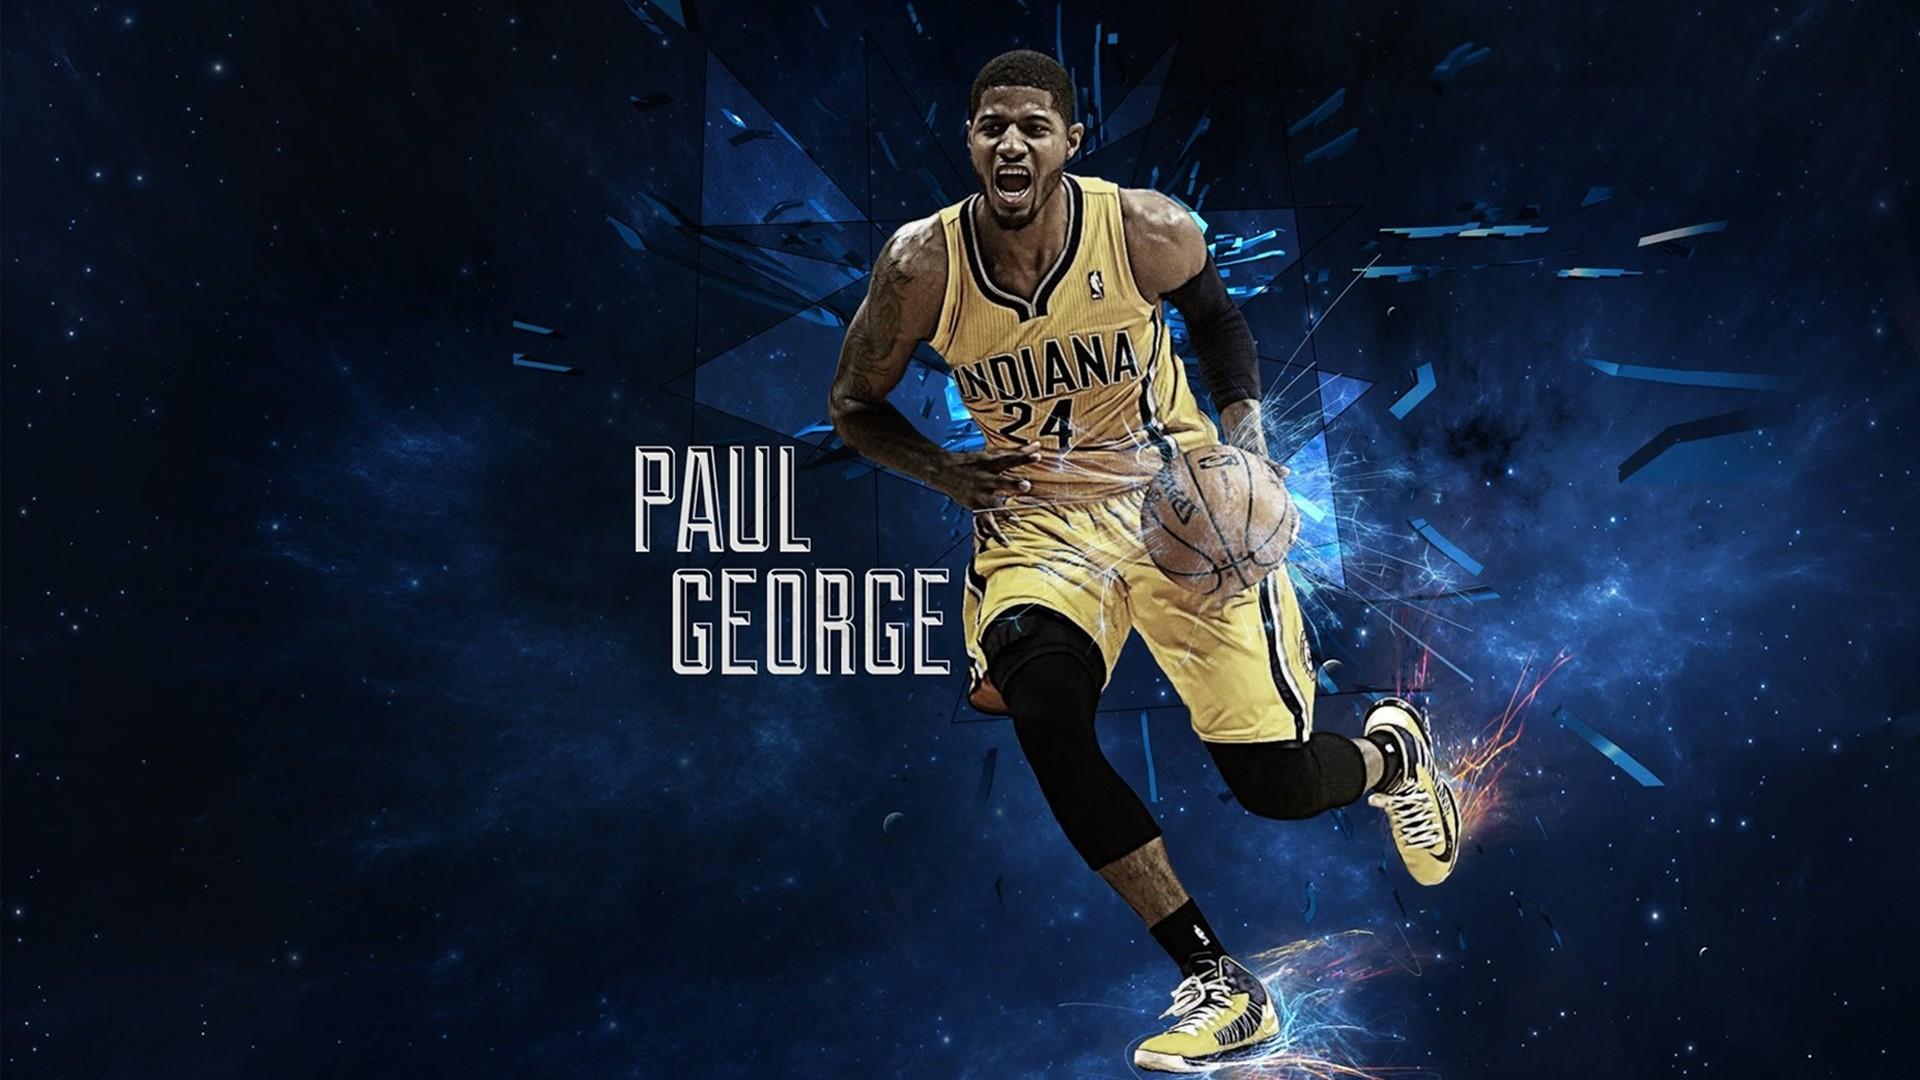 Paul George wallpaper photo hd